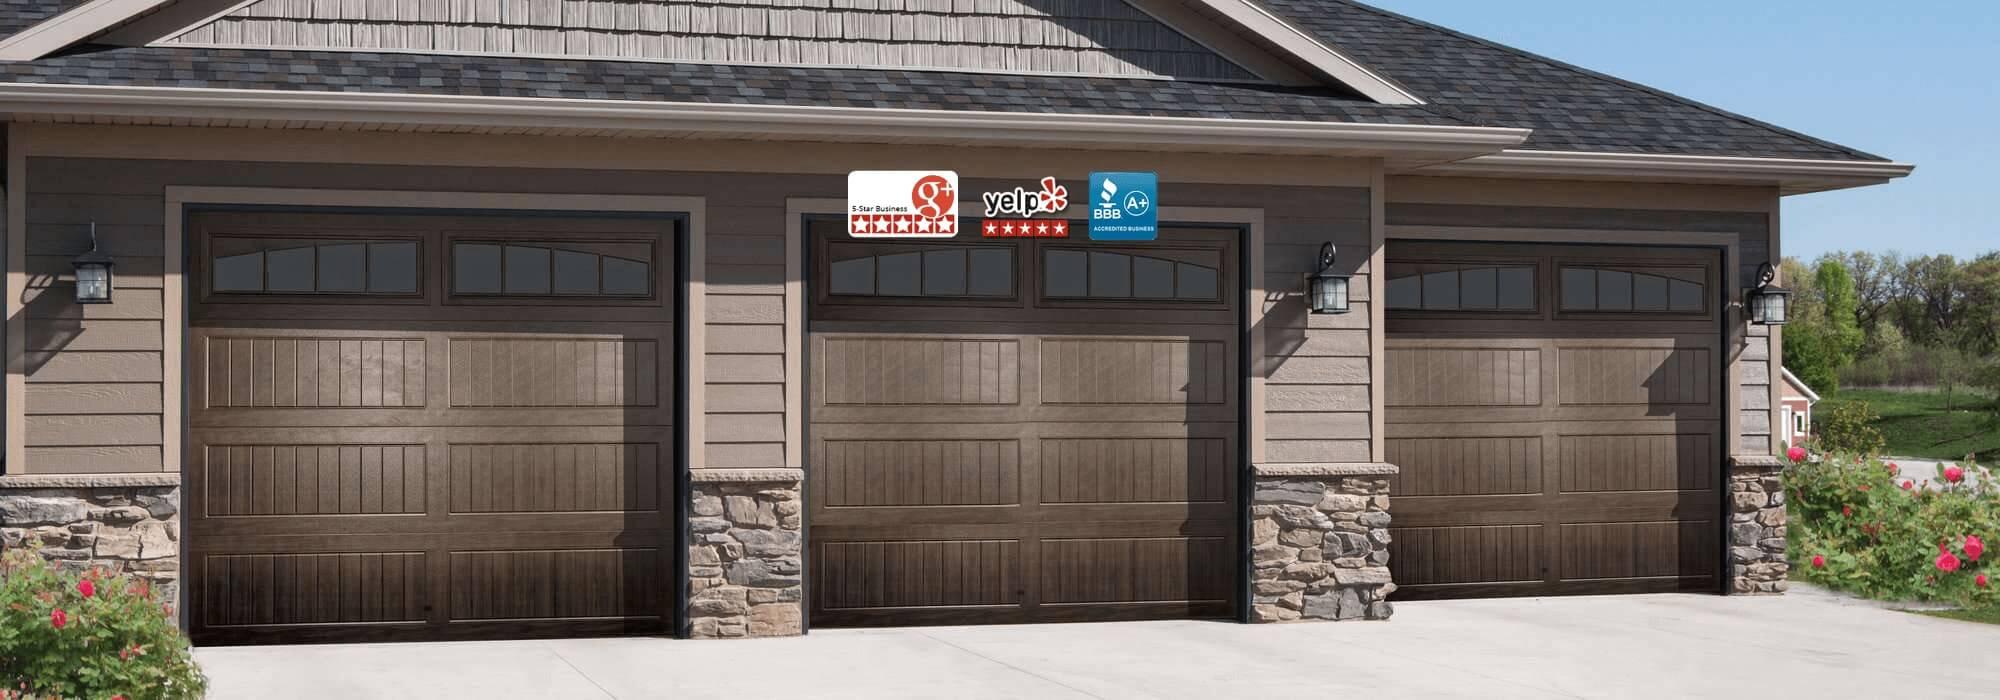 Garage door repair beverly hills ca fast service call 247 rubansaba